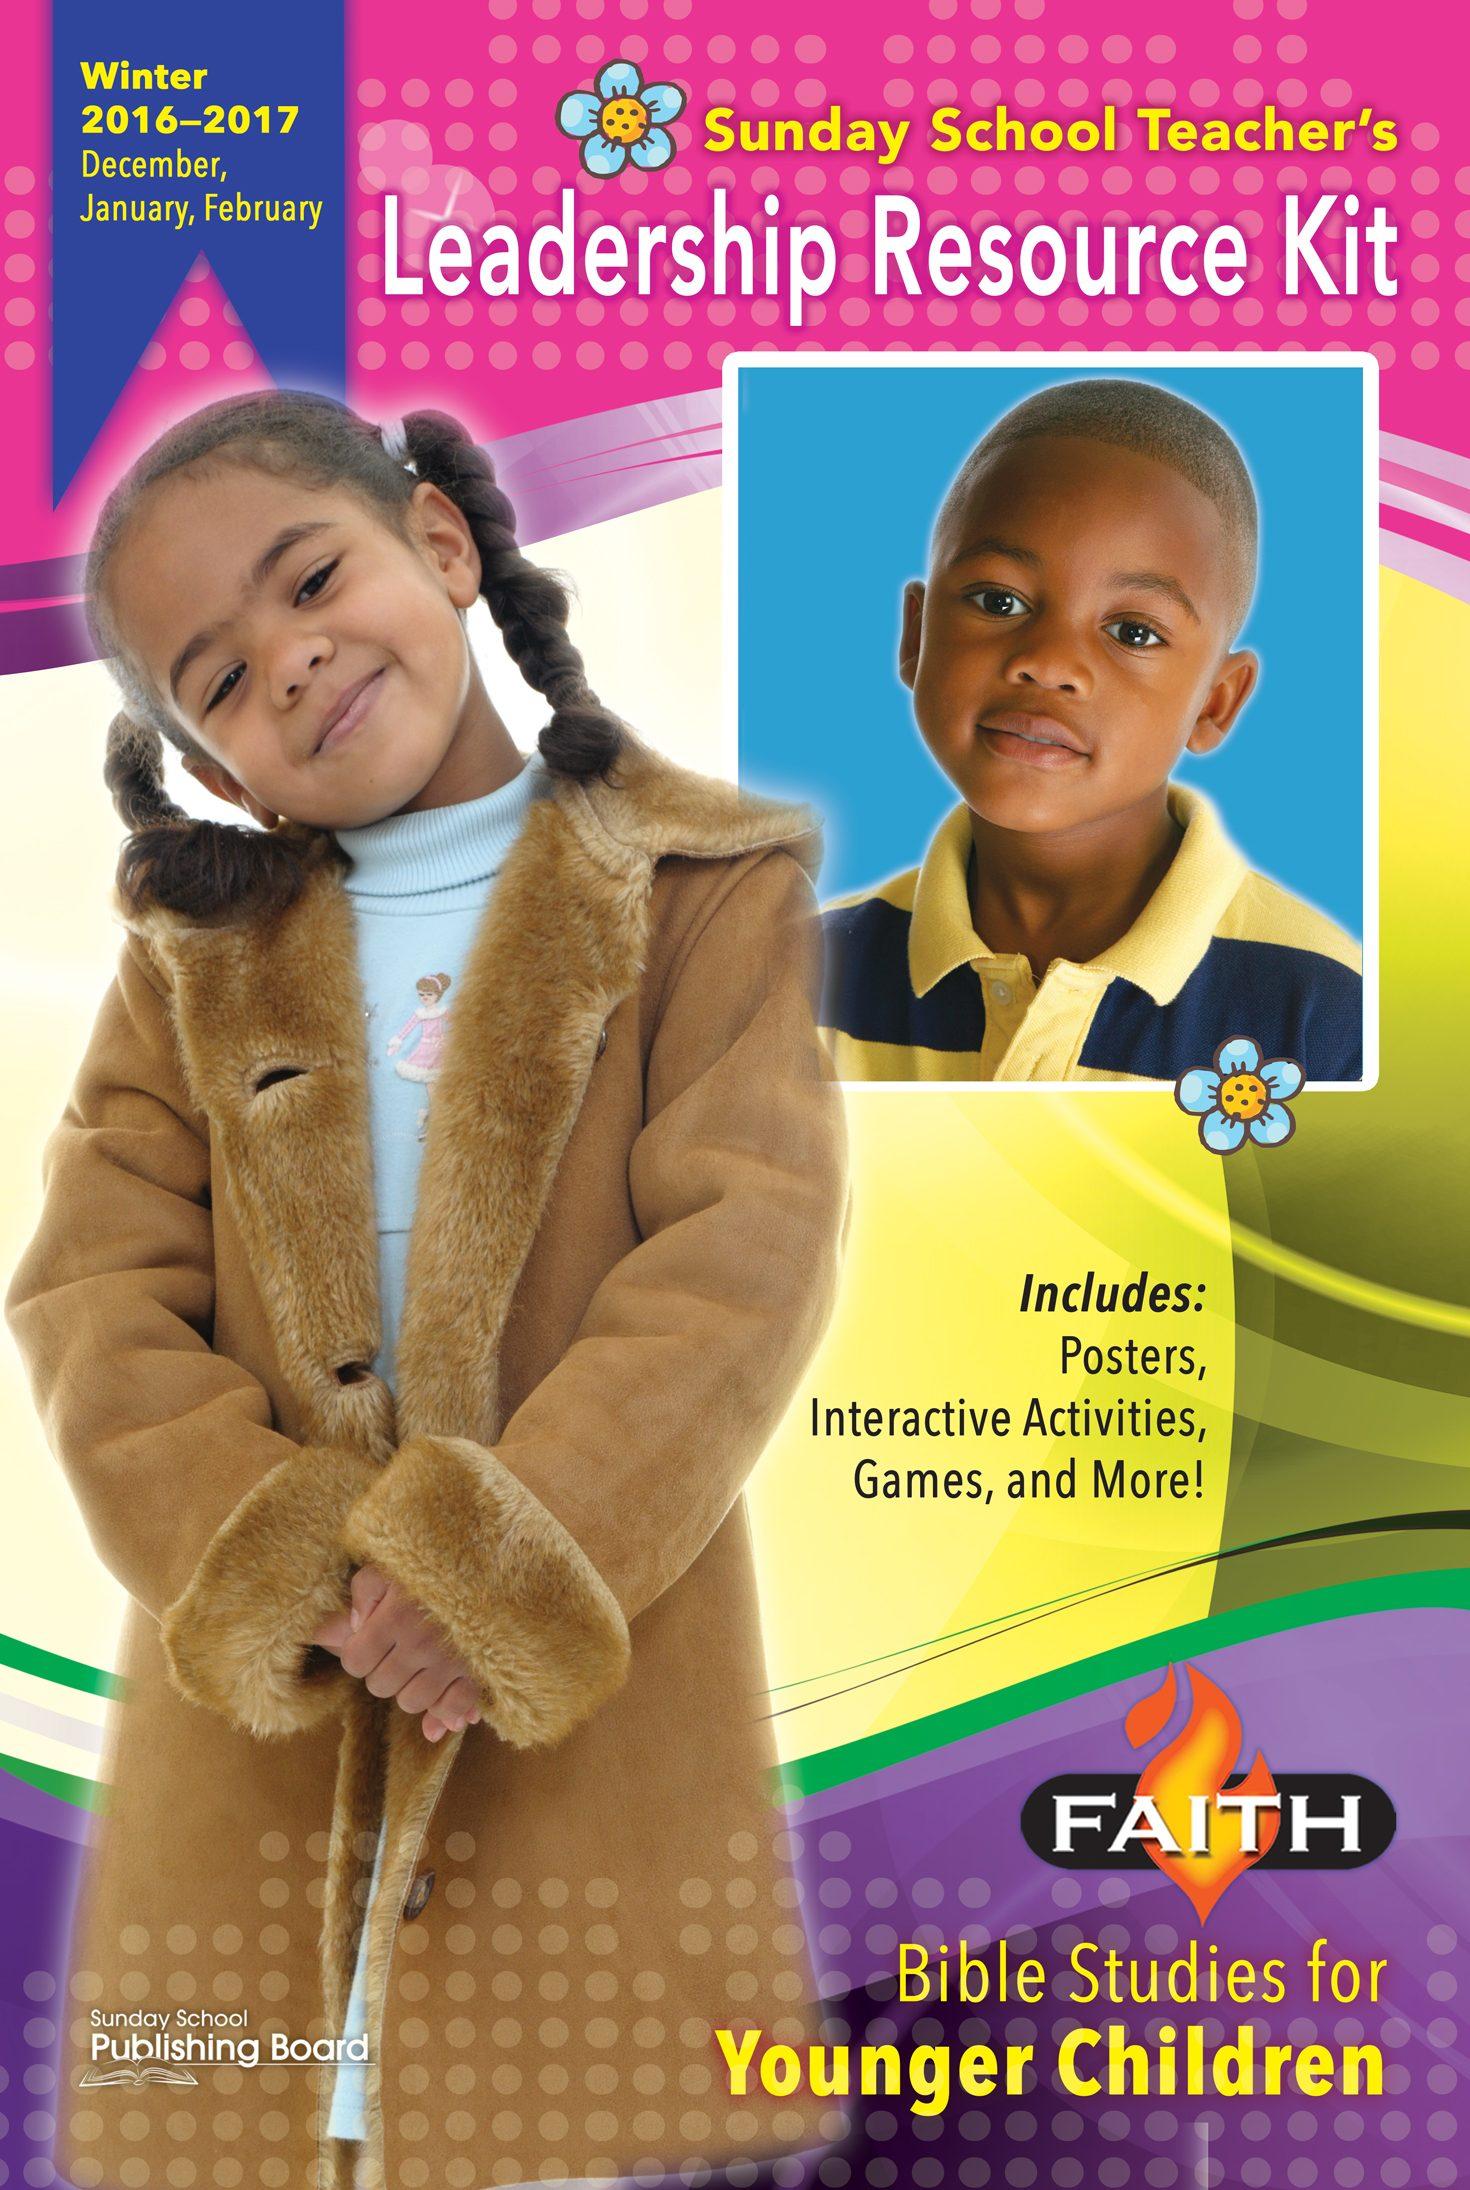 Sunday School Leadership Resource Kit - Younger Children